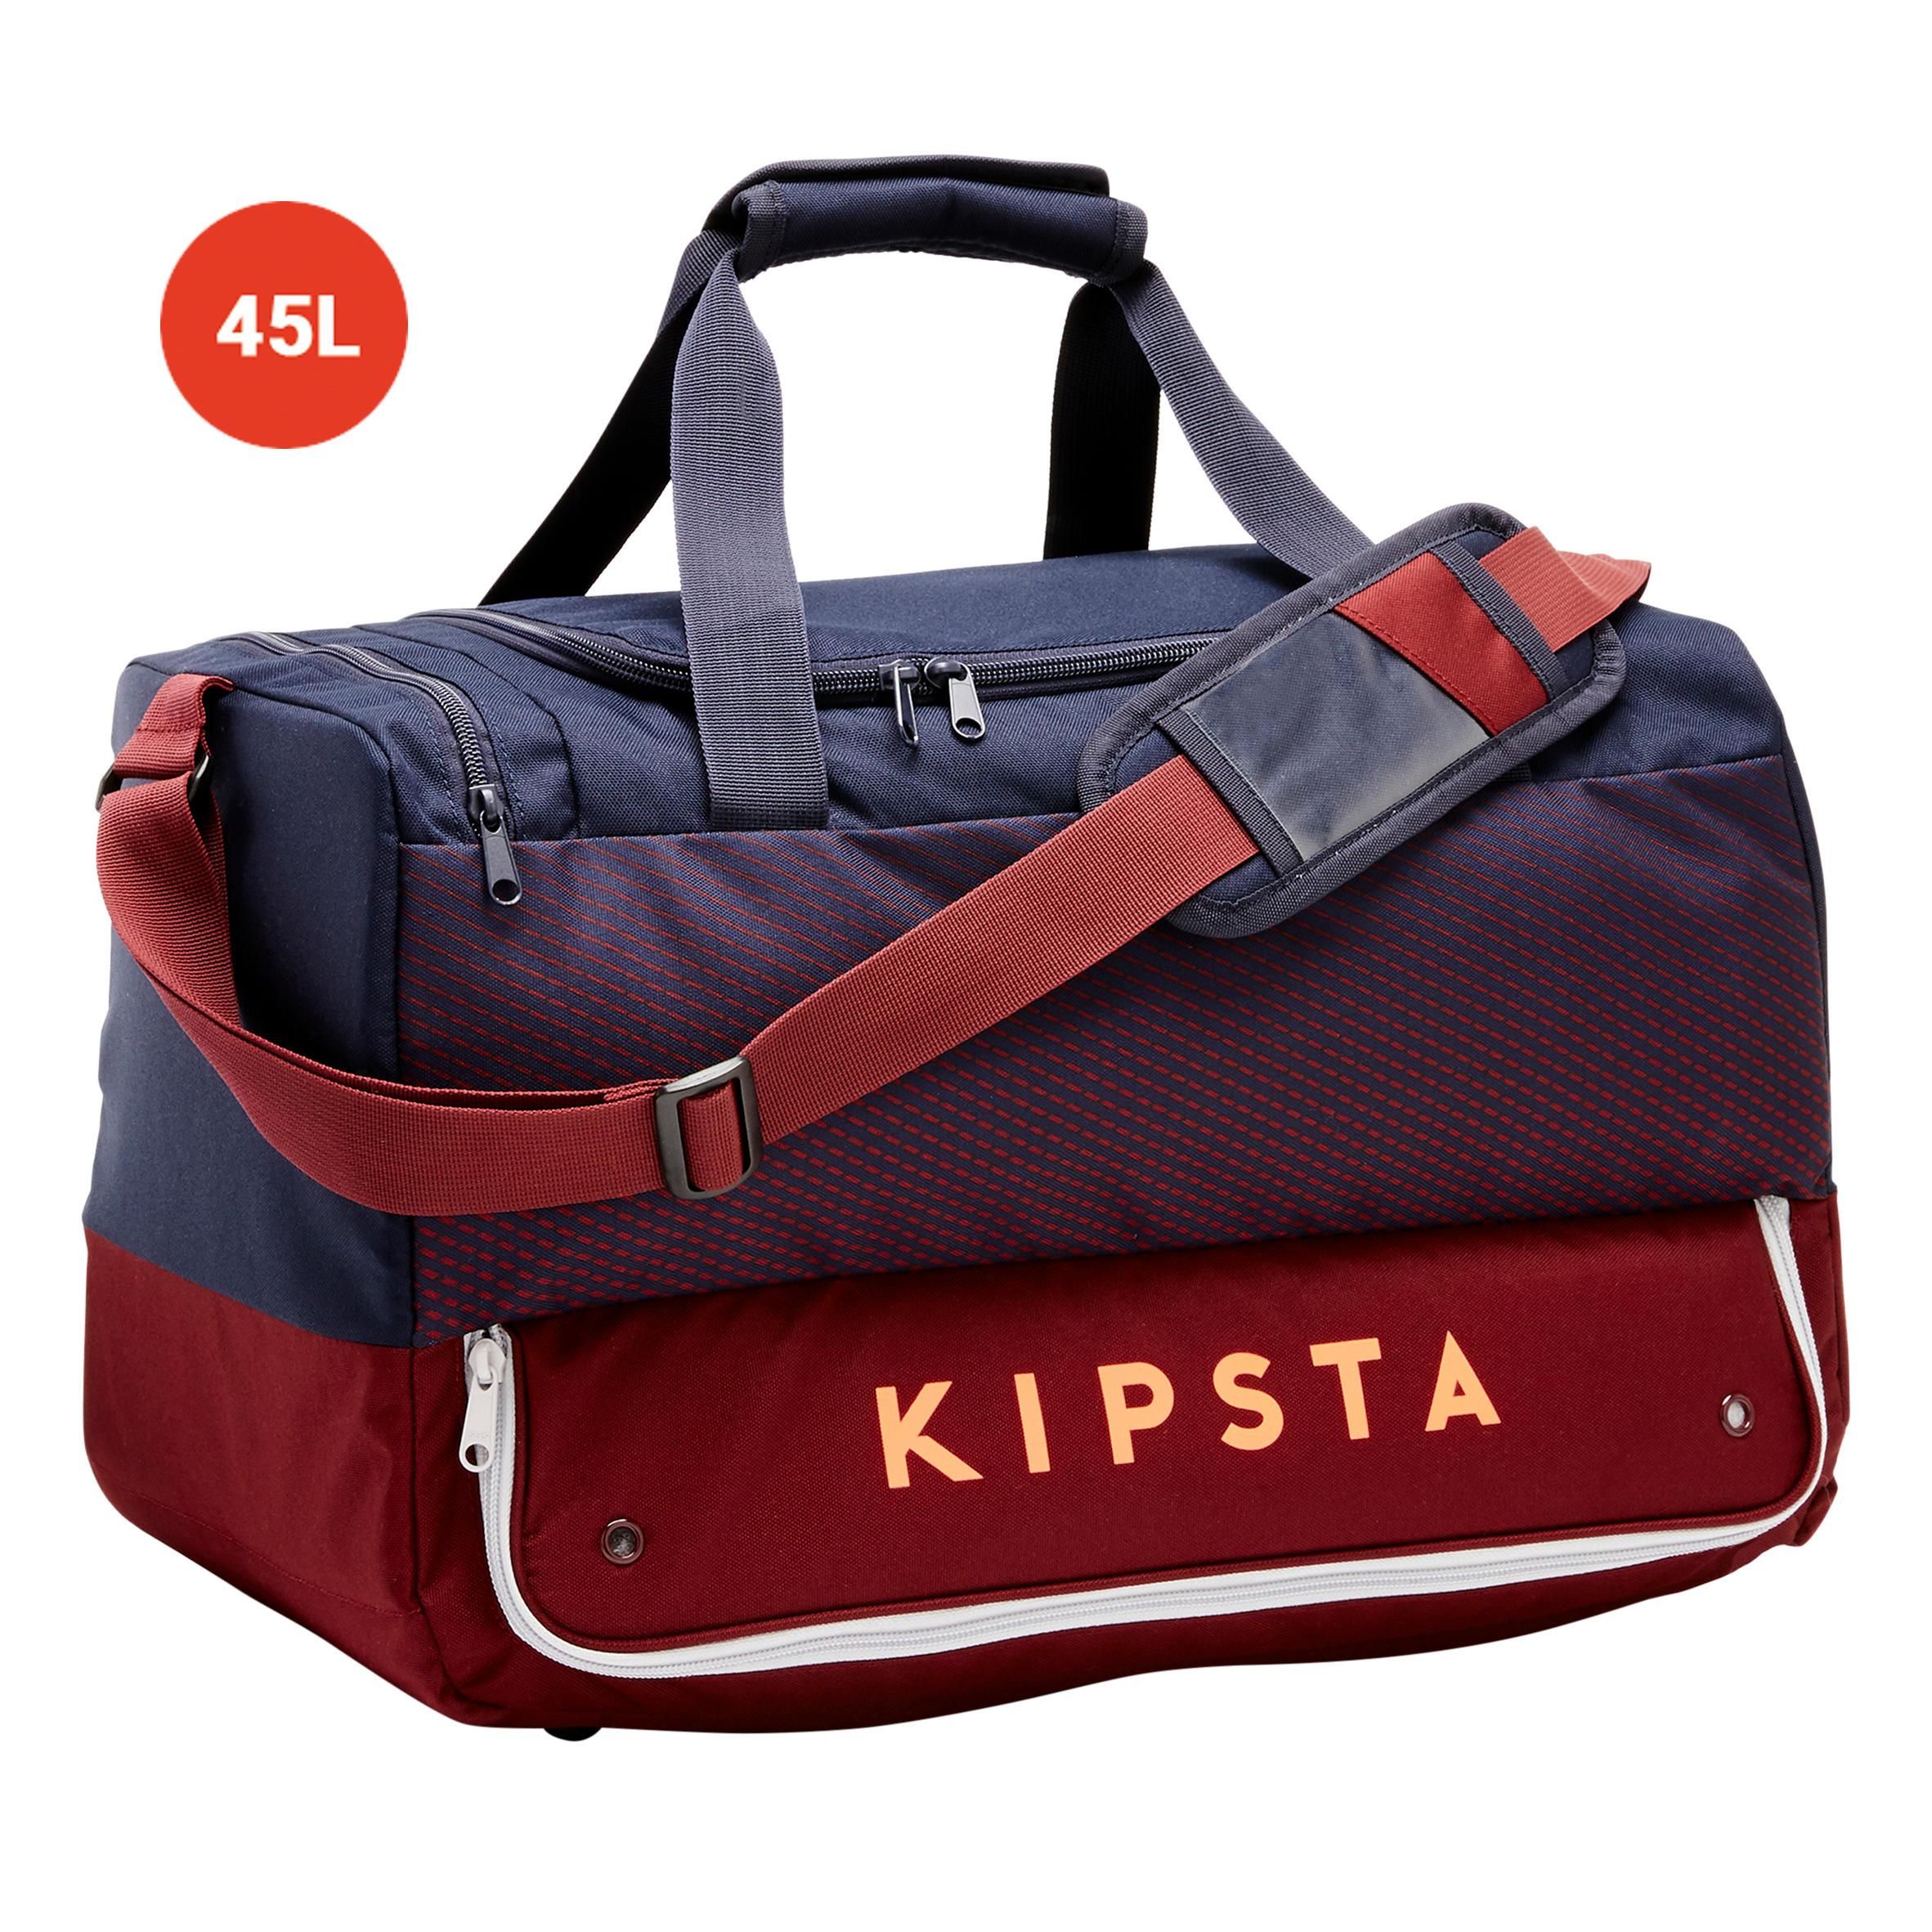 Kipsta Sporttas hardcase 45 liter blauw bordeaux